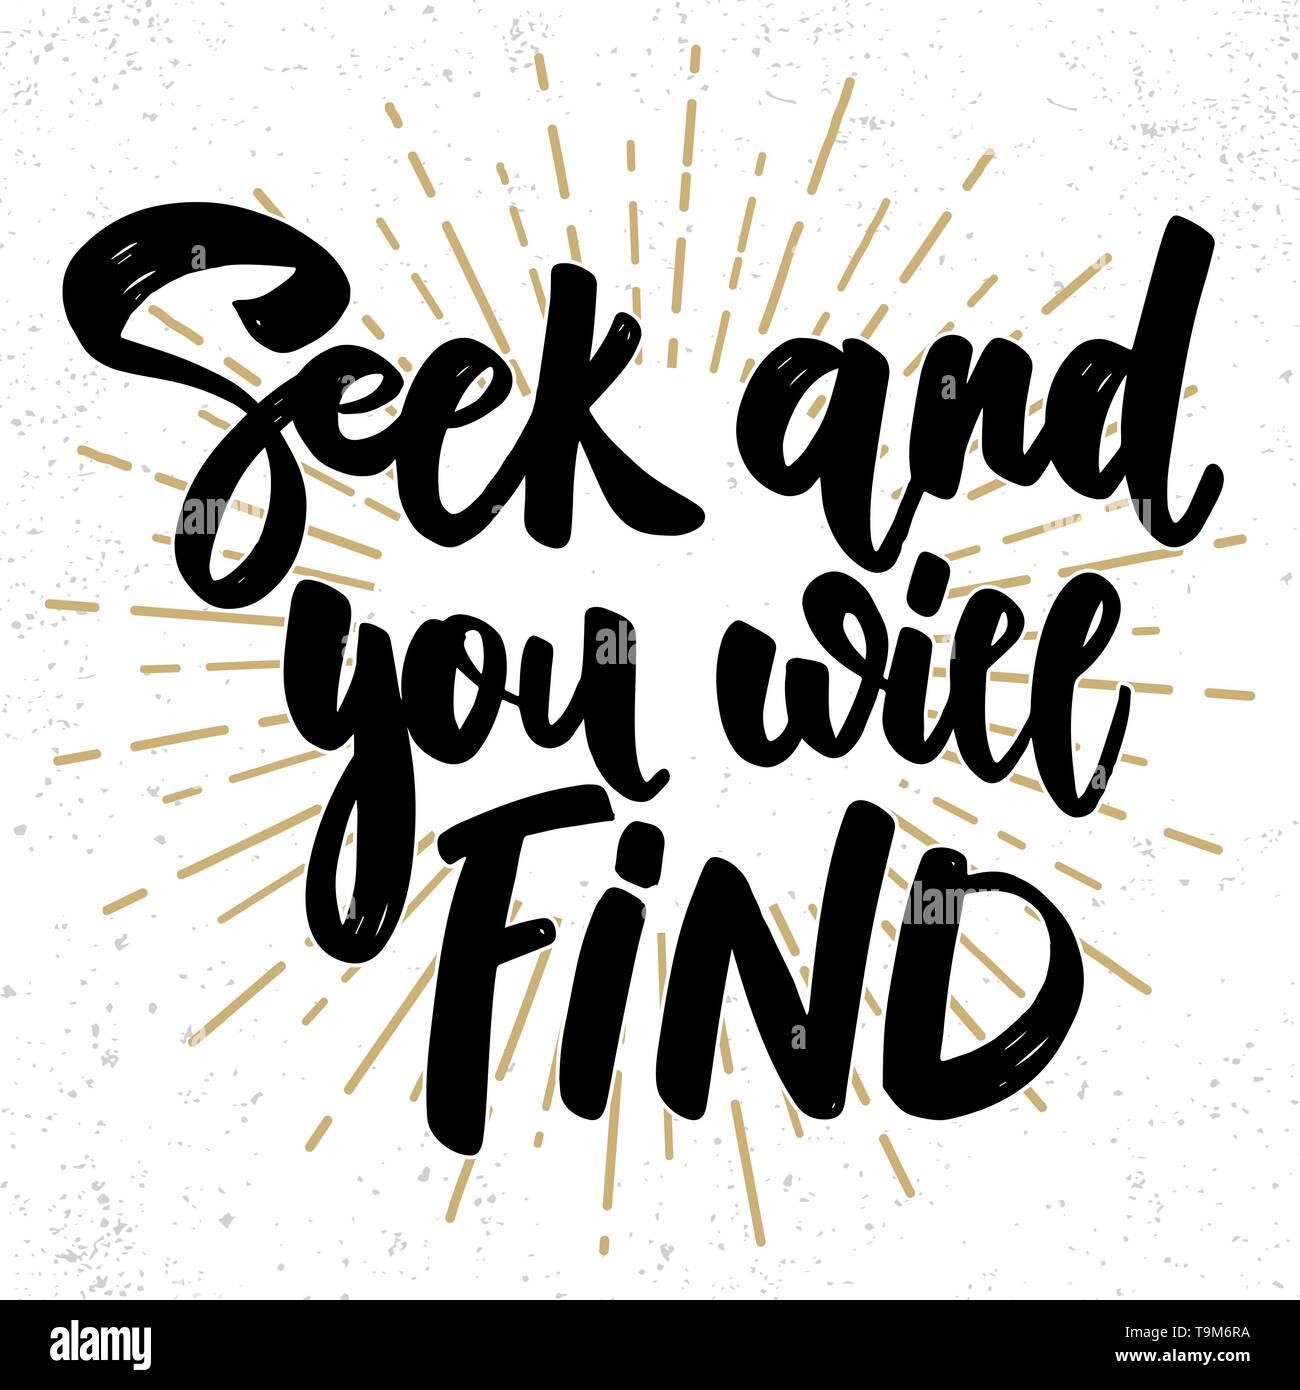 Seek and you will find. Lettering phrase on grunge background. Design element for poster, card, banner, sign. Vector illustration - Stock Image